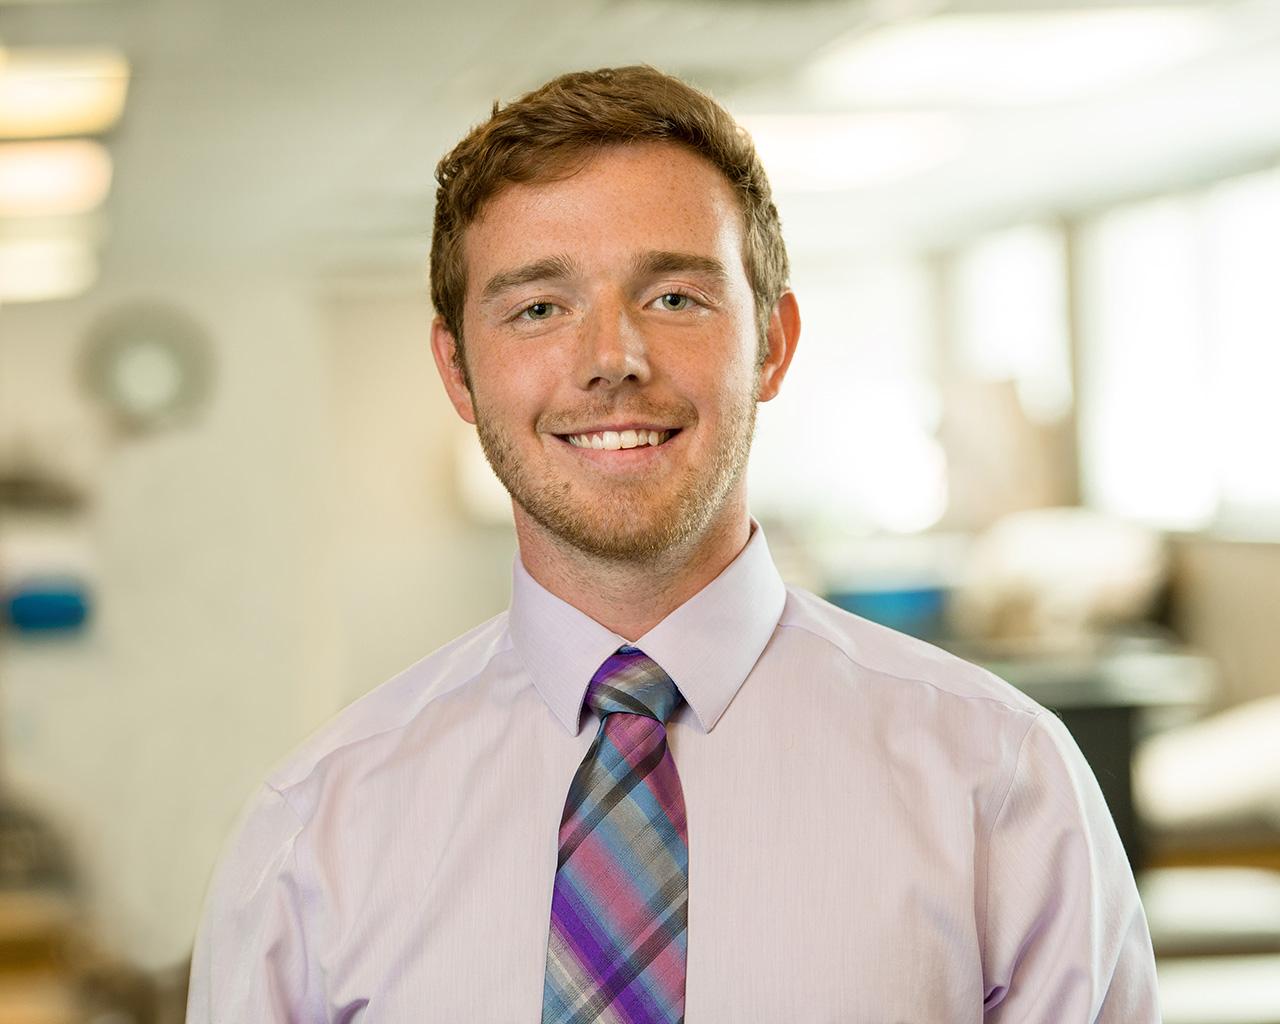 Stephen Spencer - PT, DPT, Staff Physical Therapist